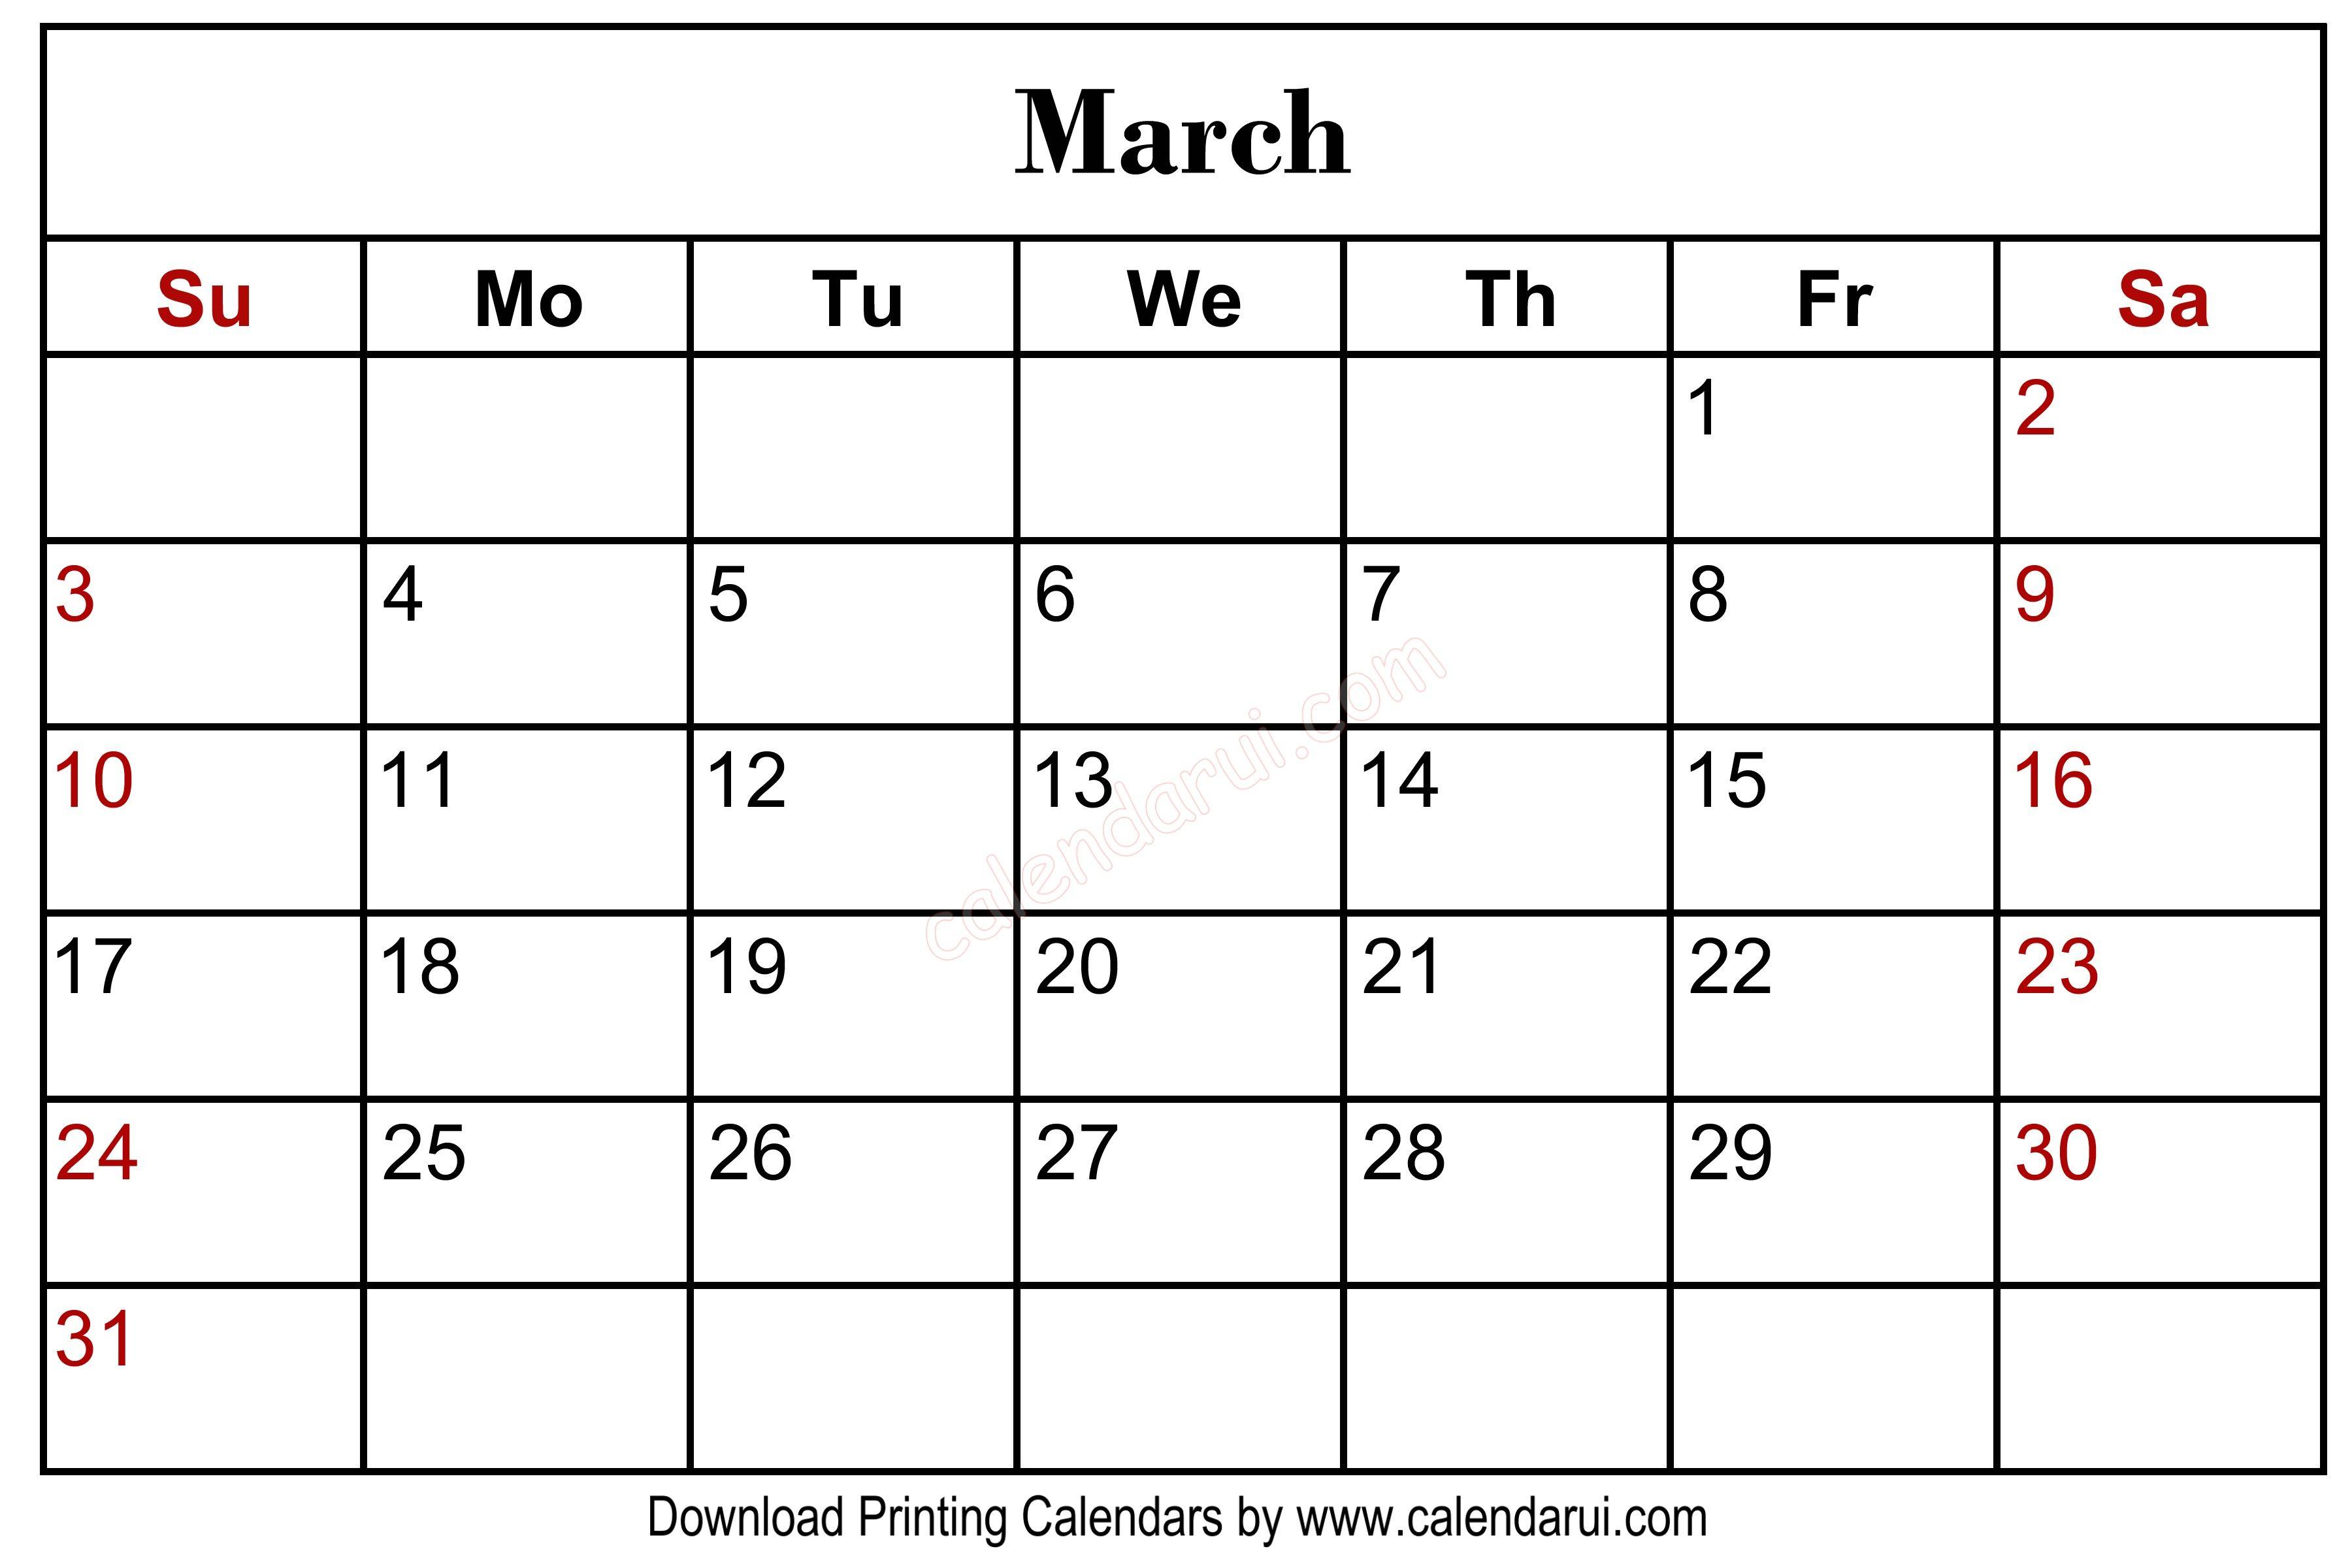 March 2020 Blank Calendar Printable Centre Header In 2019